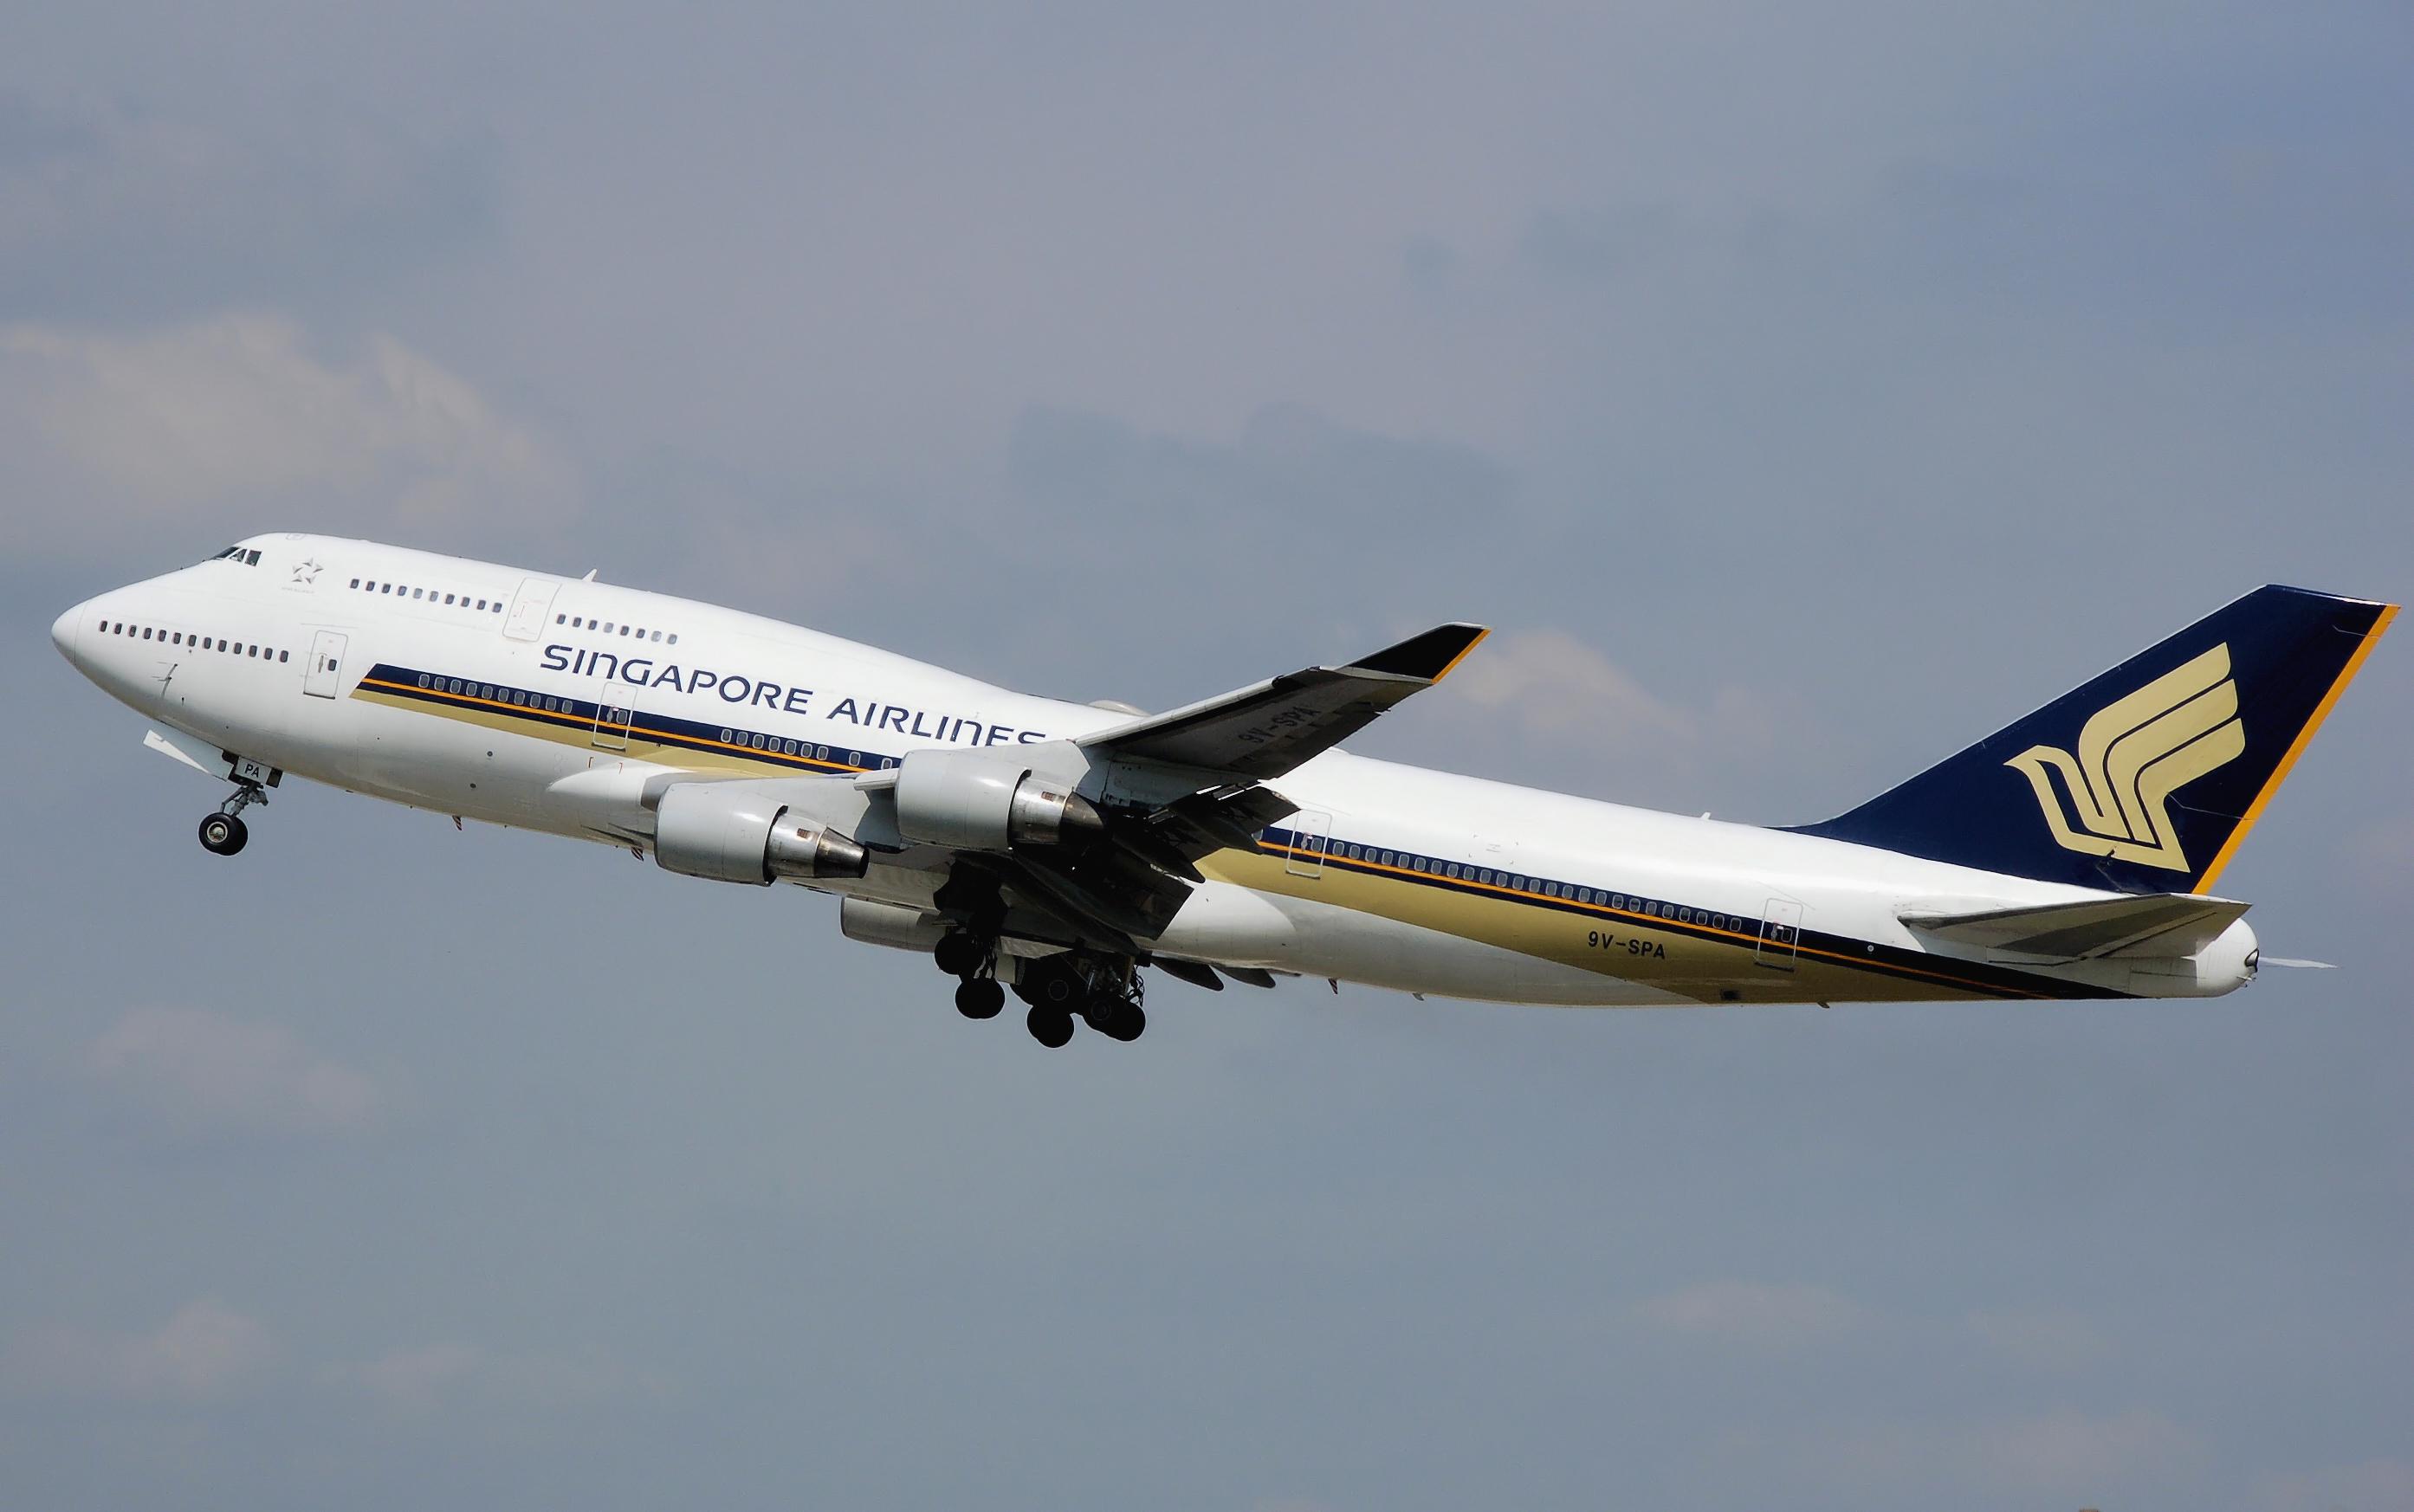 file singapore airlines b747 400 9v spa arp